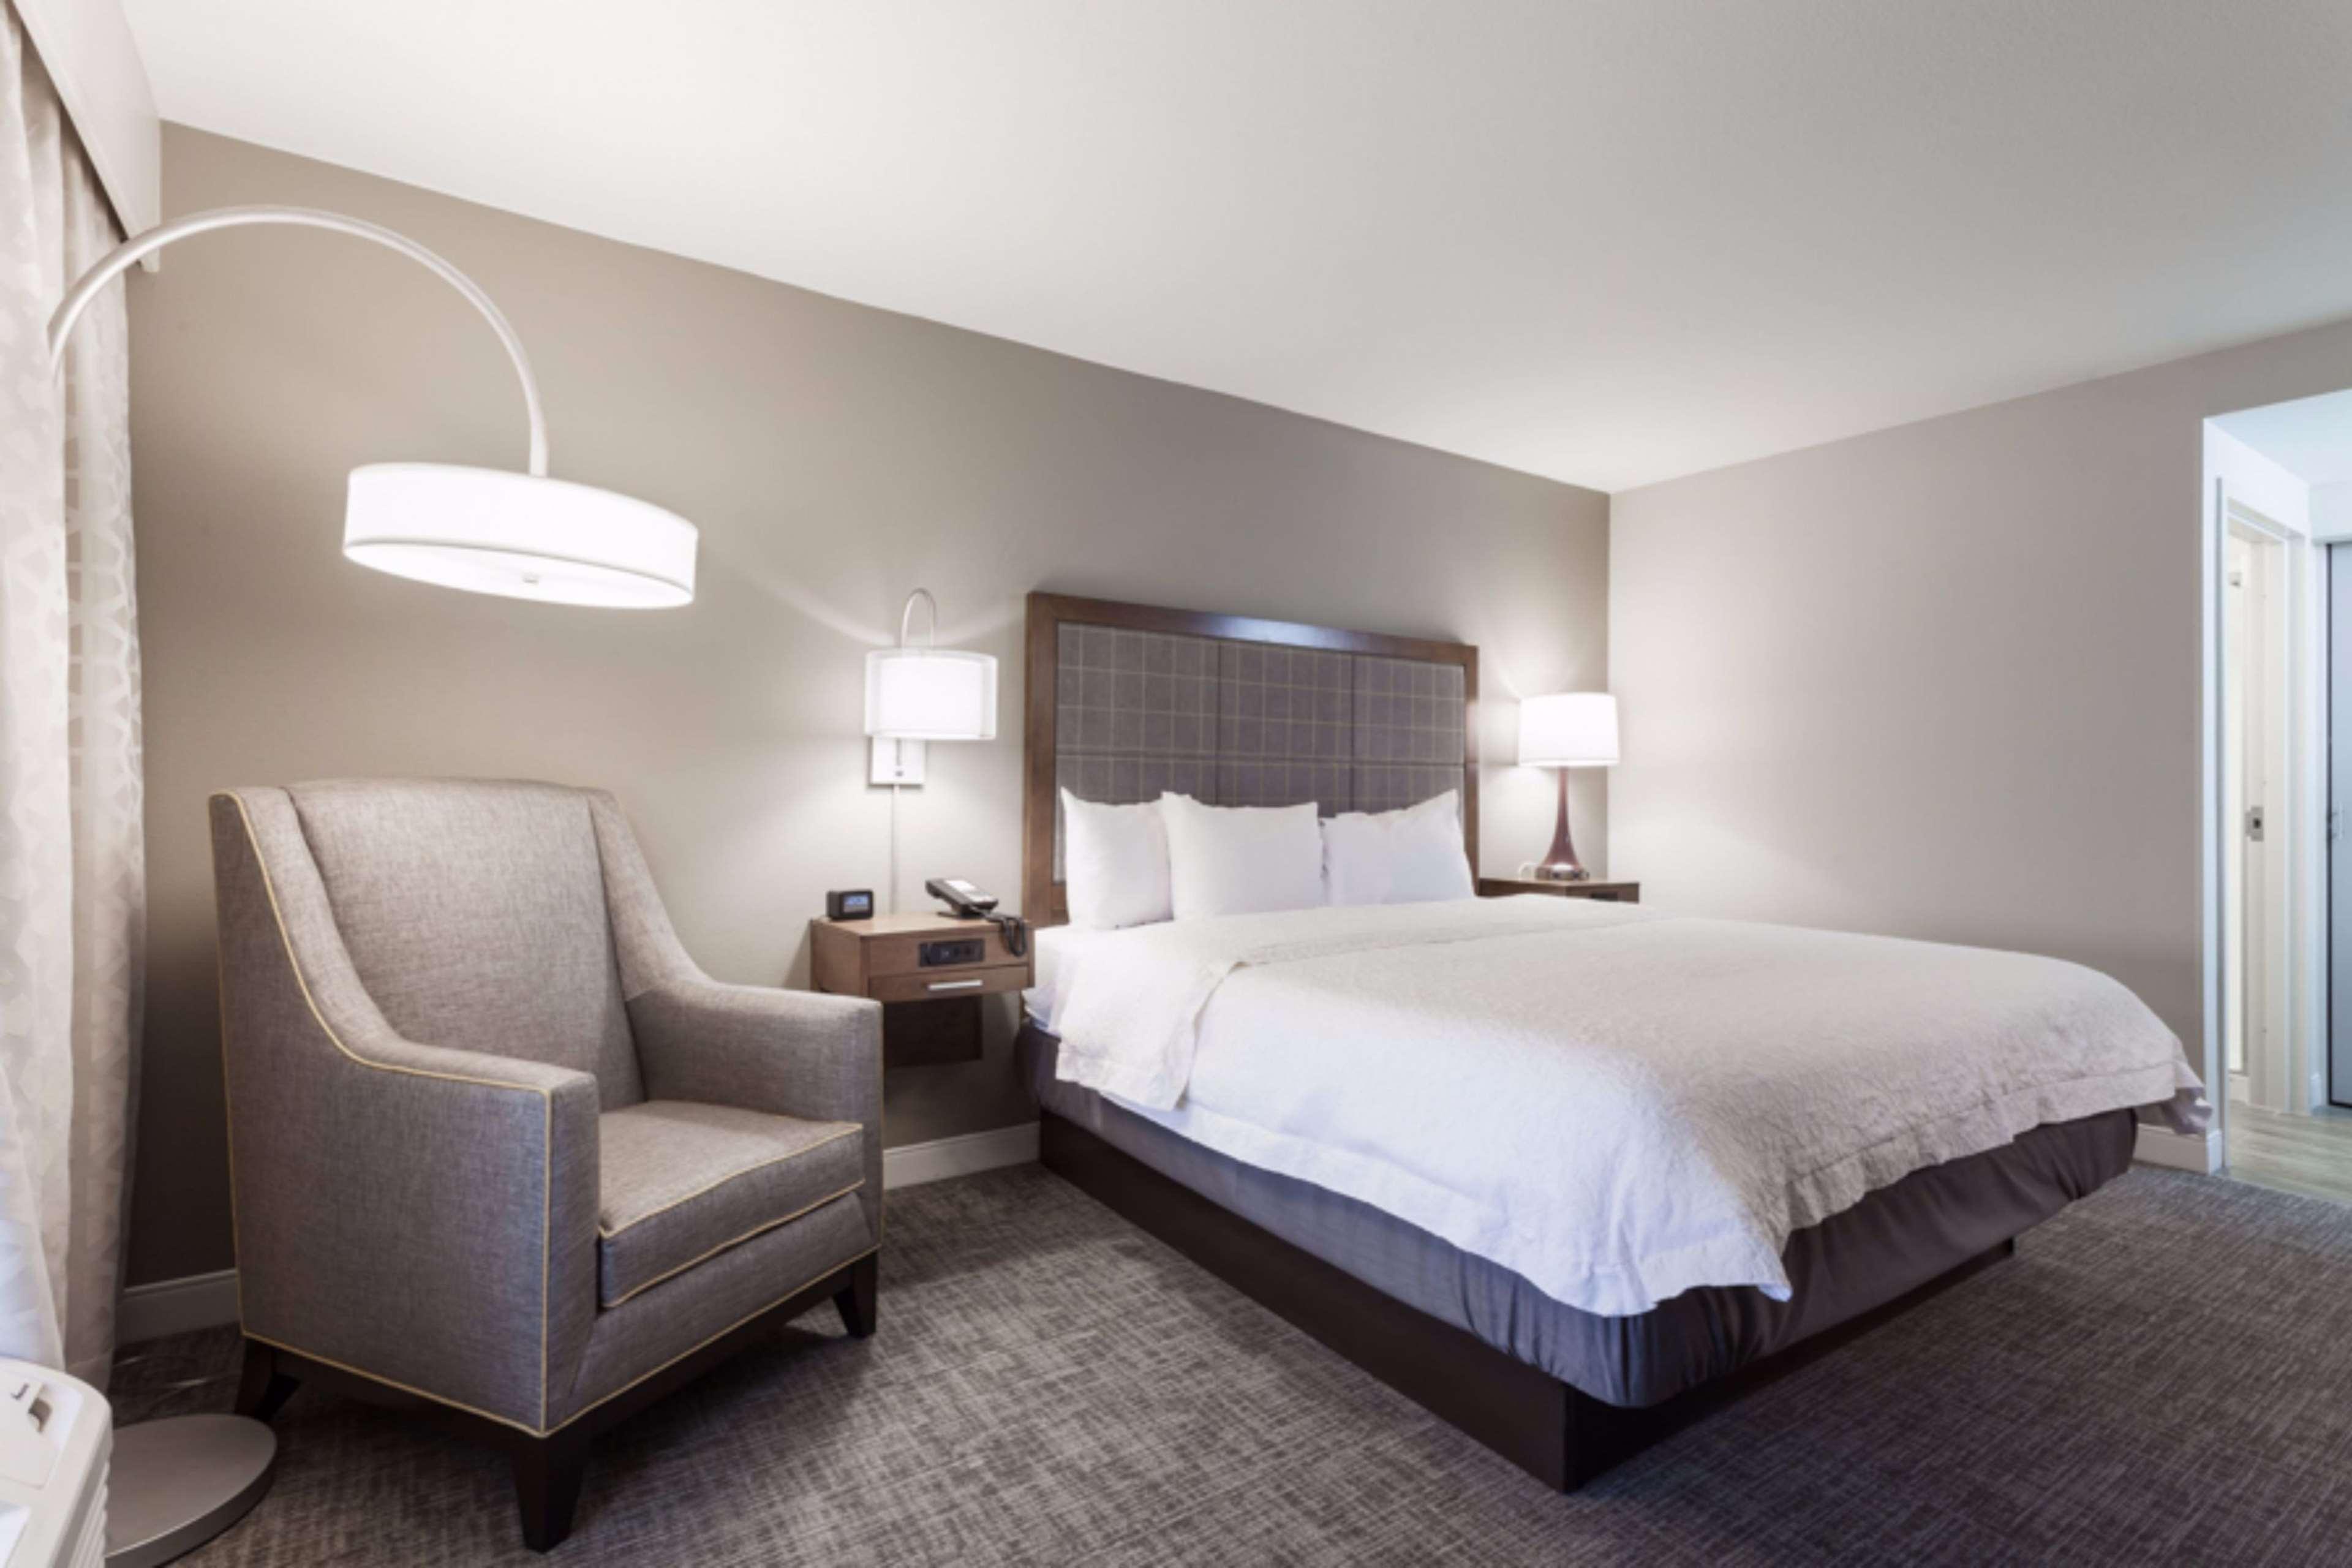 Hampton Inn & Suites Dallas-DFW Airport North-Grapevine image 24